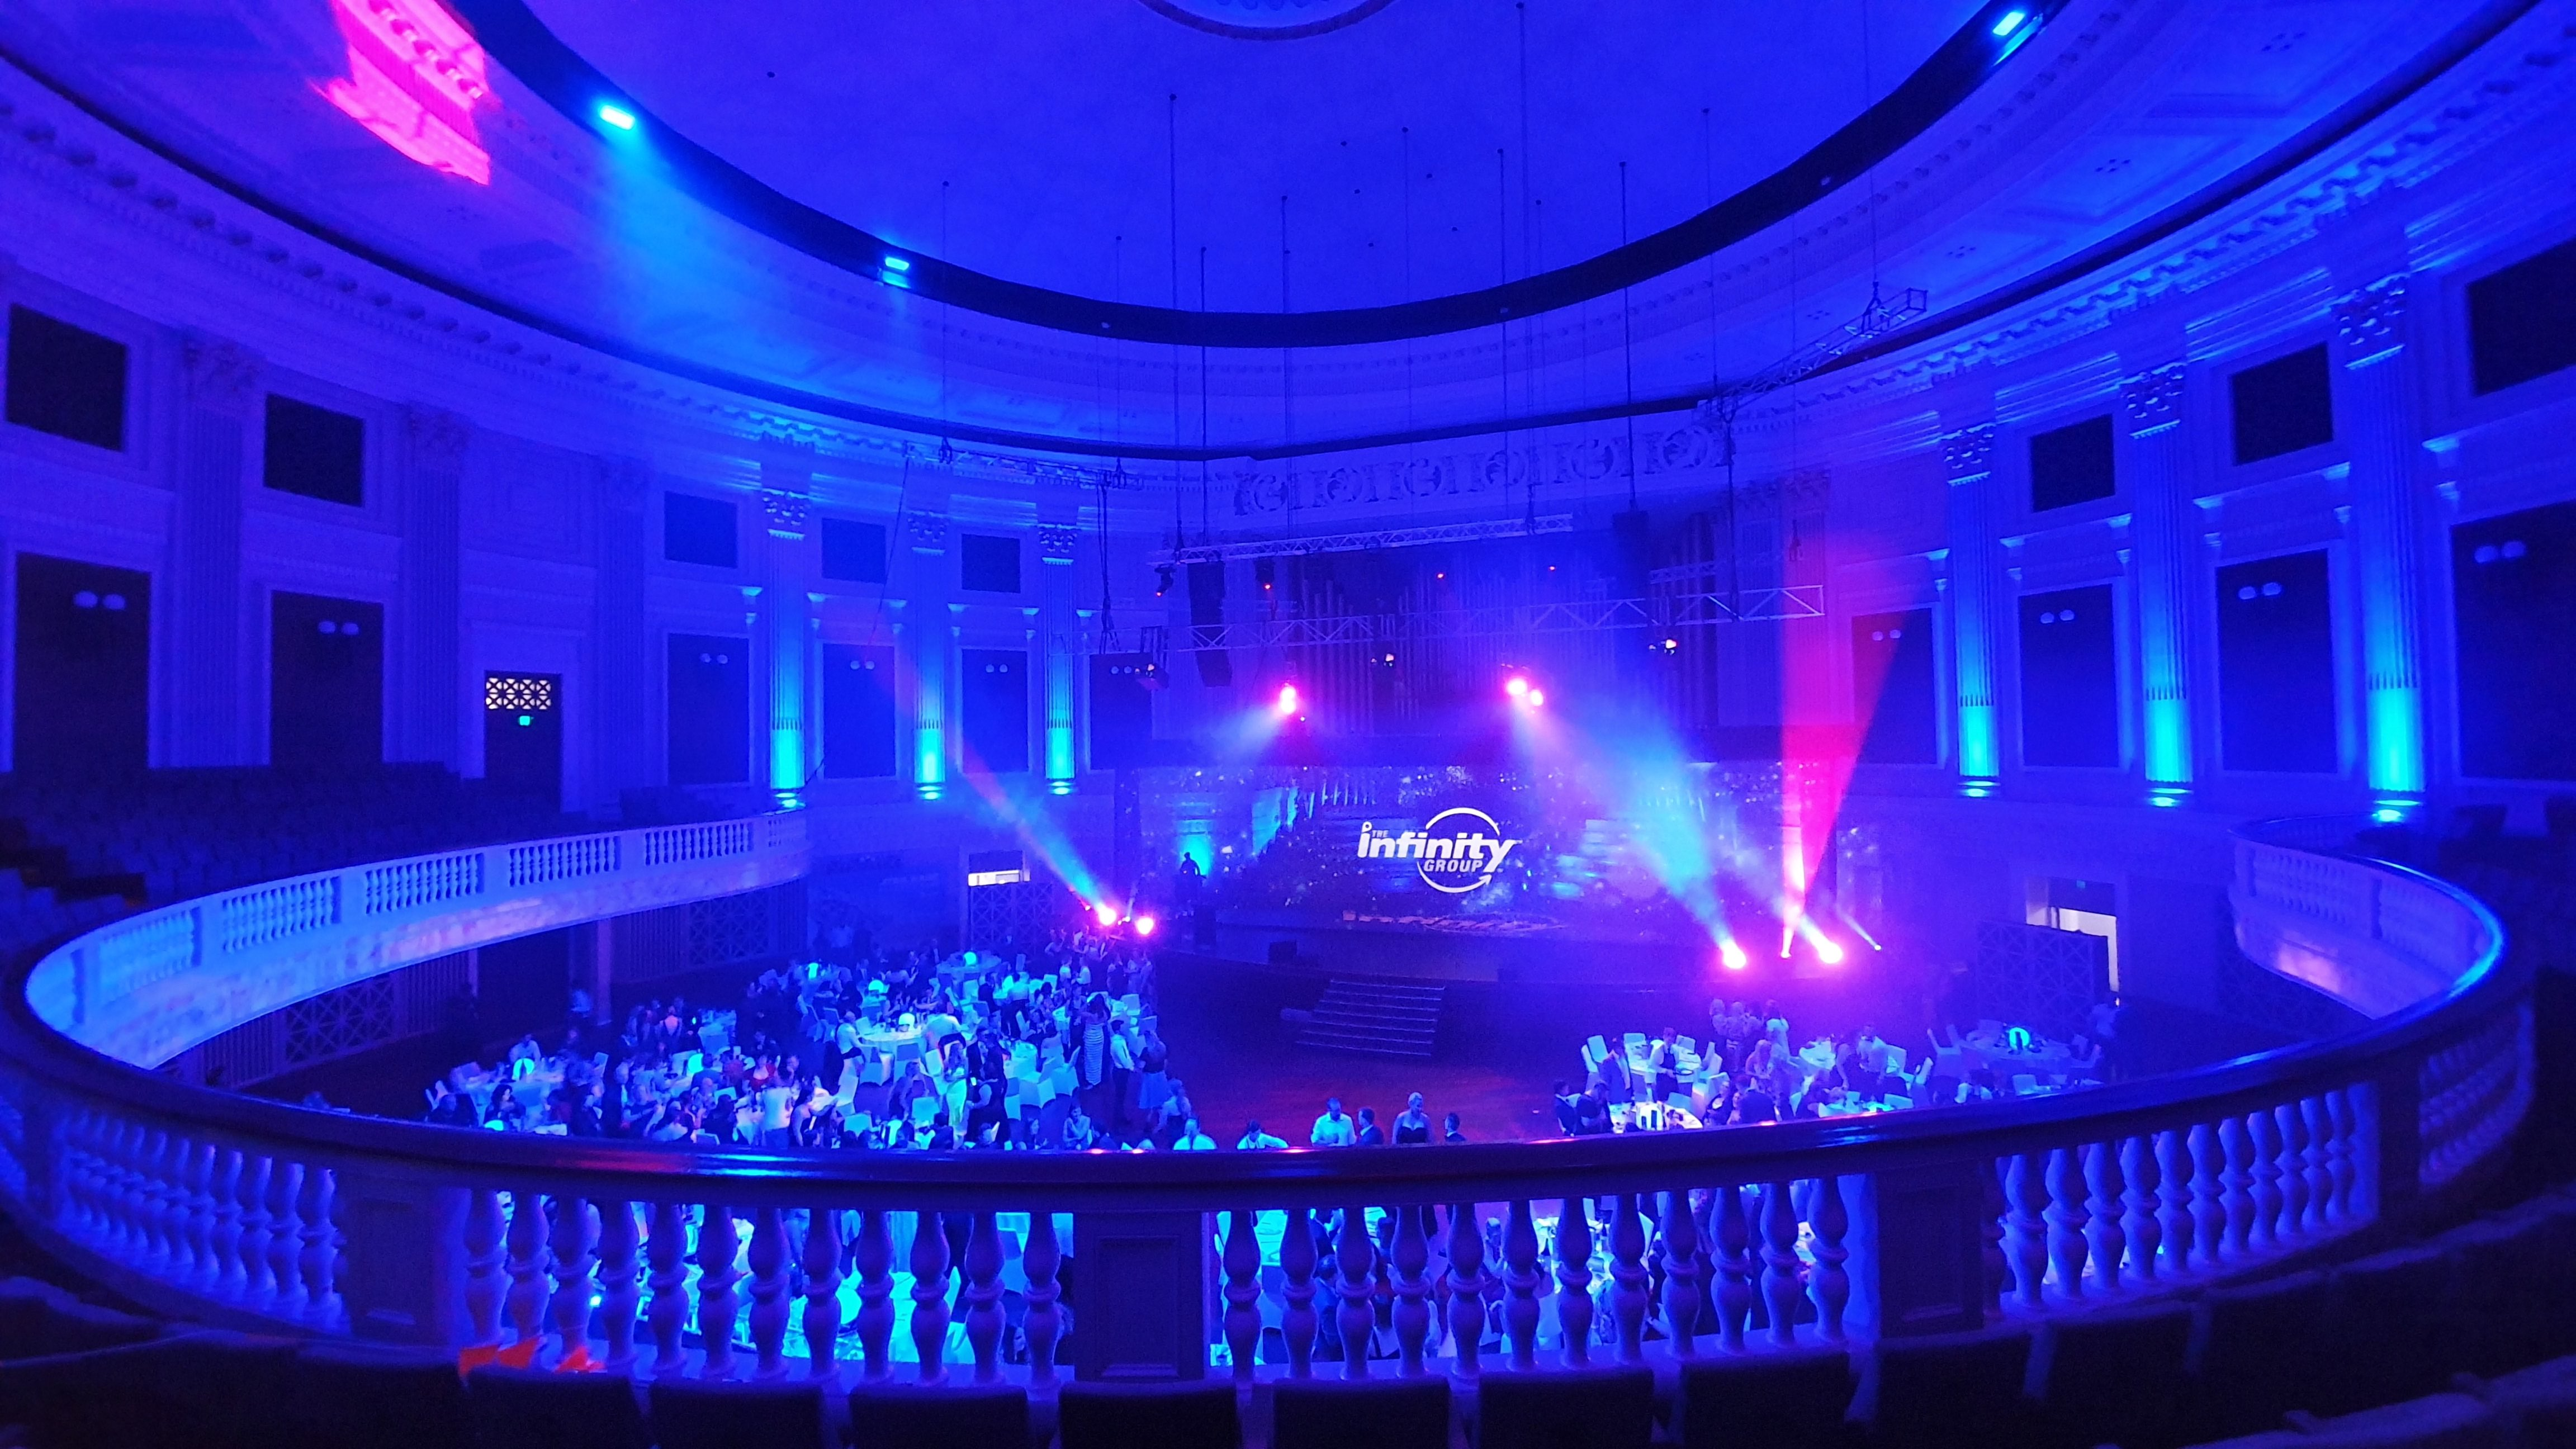 Infinity, Brisbane City Hall